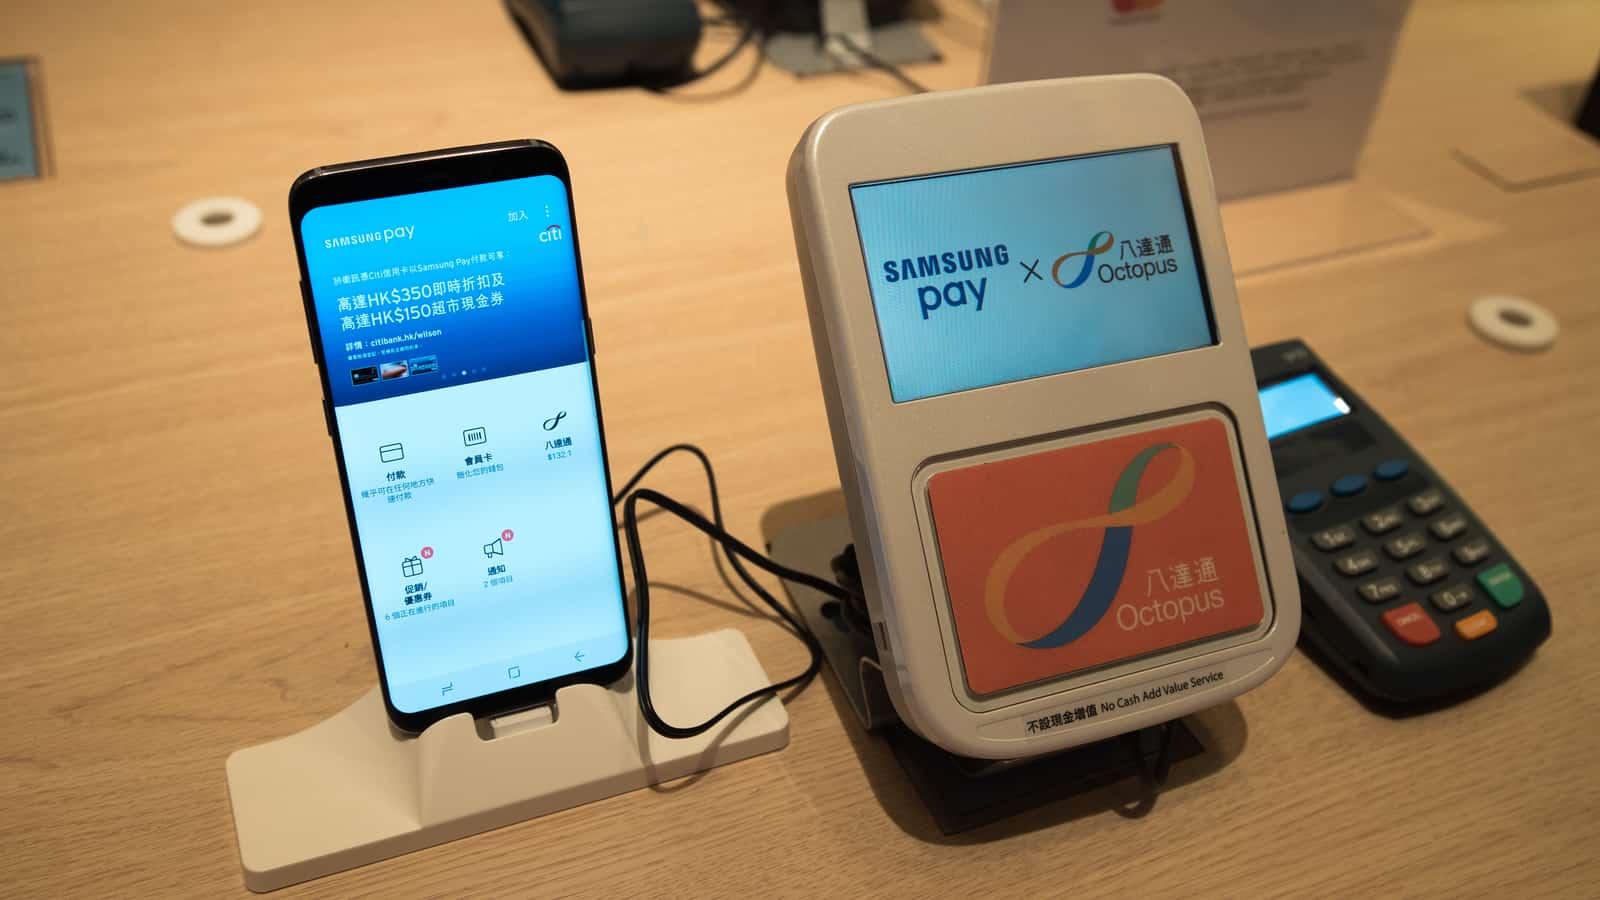 Samsung Pay 八達通香港 推 Smart Octopus 流動支付錢包 - 香港 unwire.hk